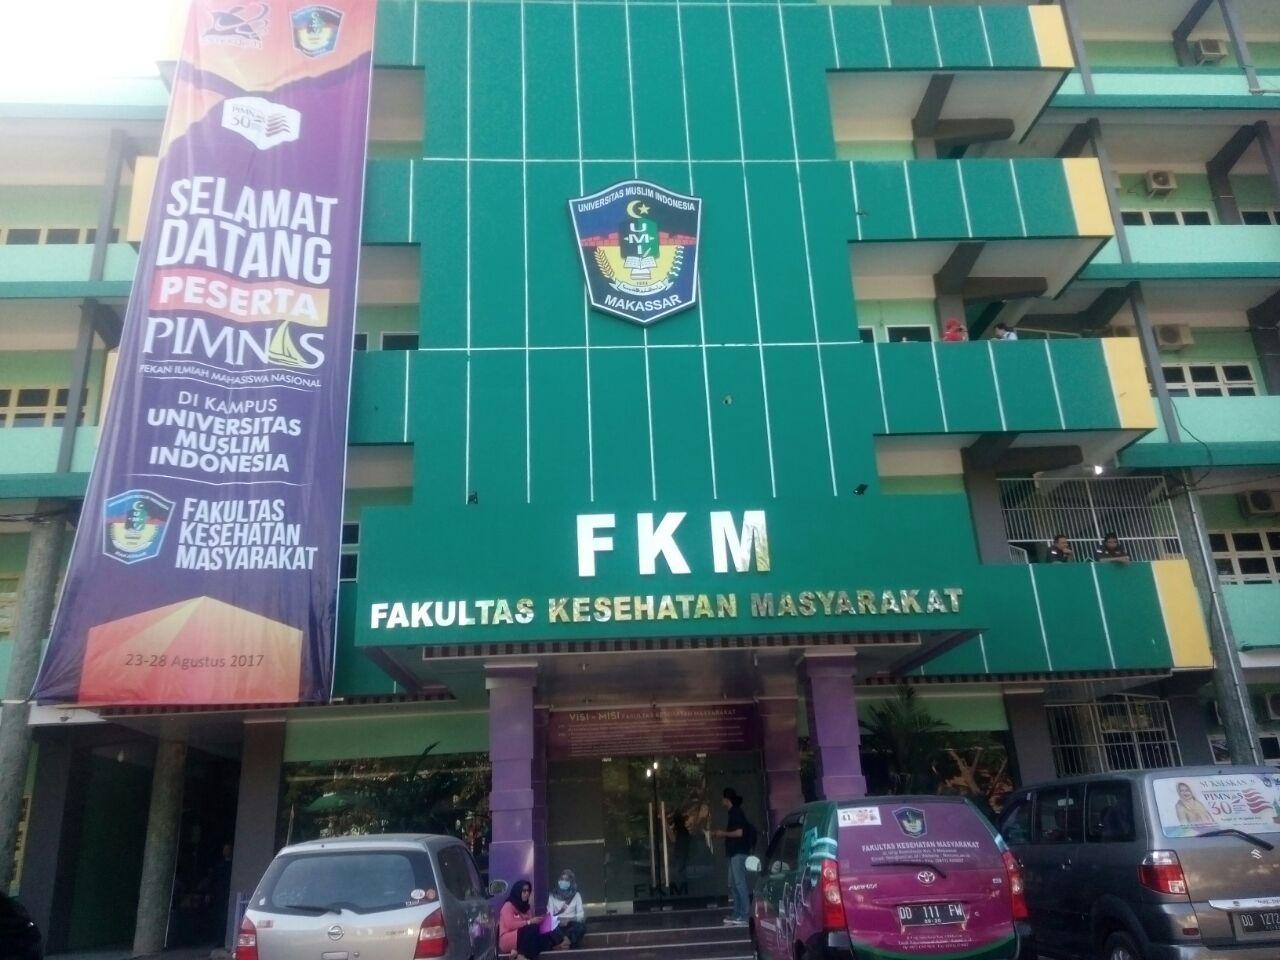 Fakultas Kesehatan Masyarakat Universitas Muslim Indonesia (FKM UMI)